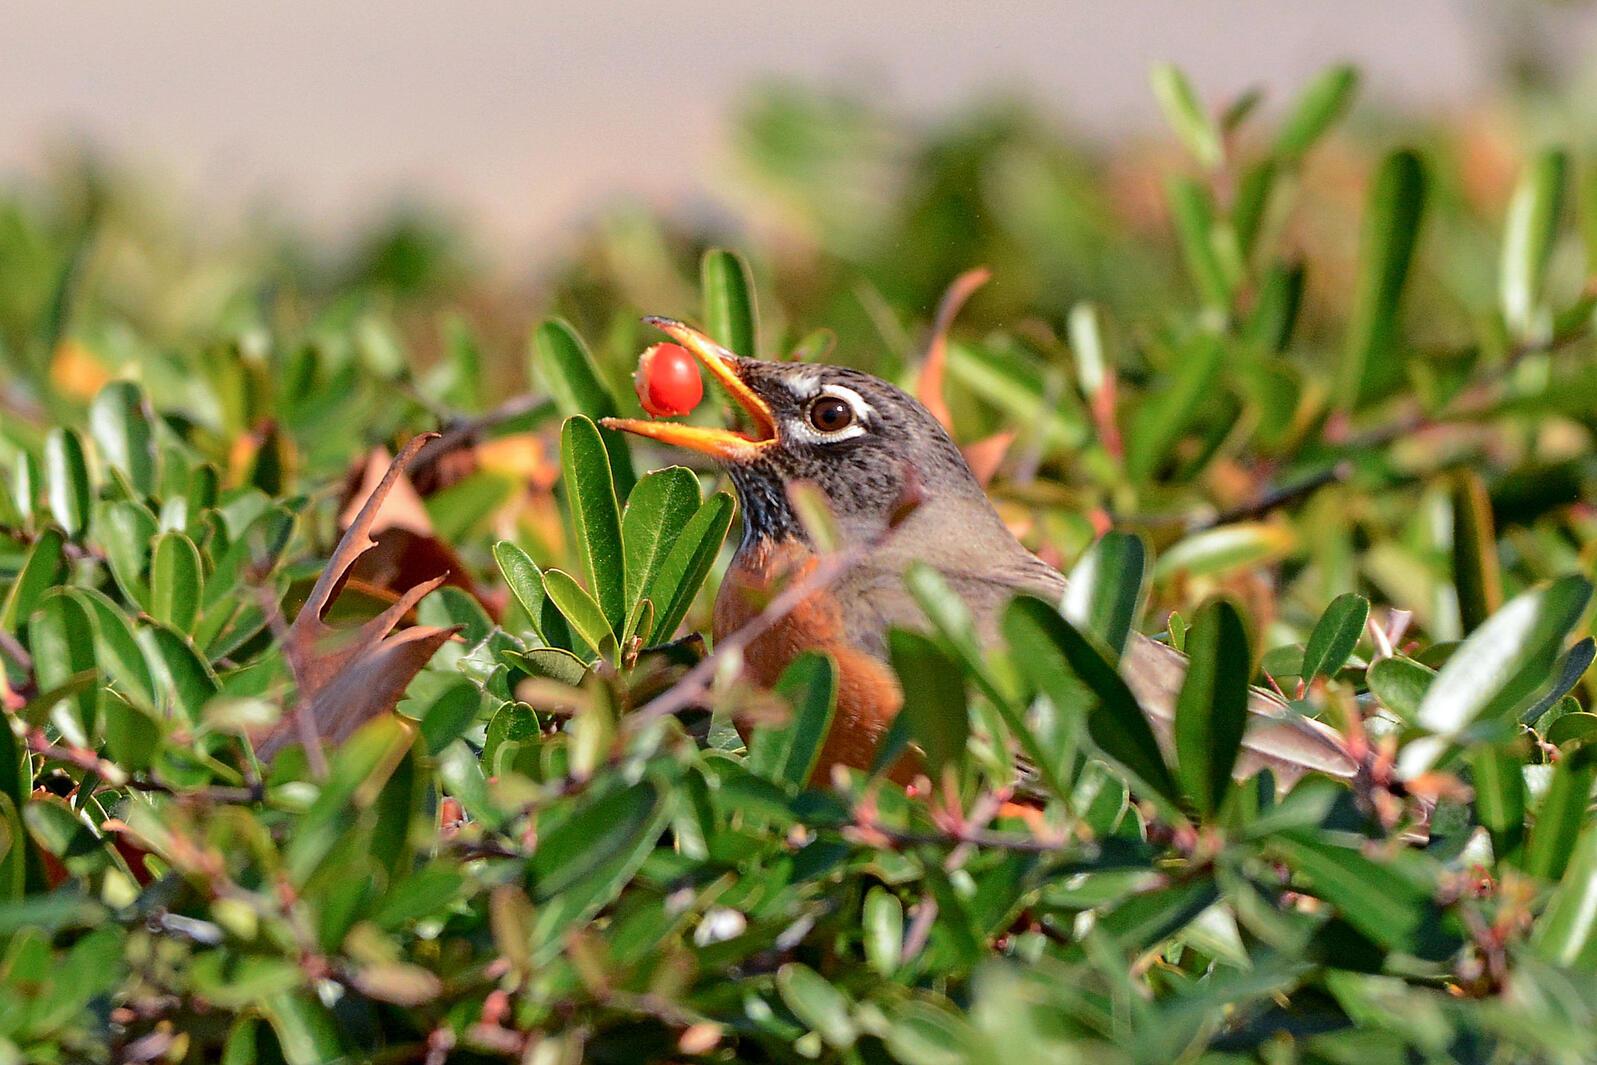 American Robin. Donald Metzner/Great Backyard Bird Count